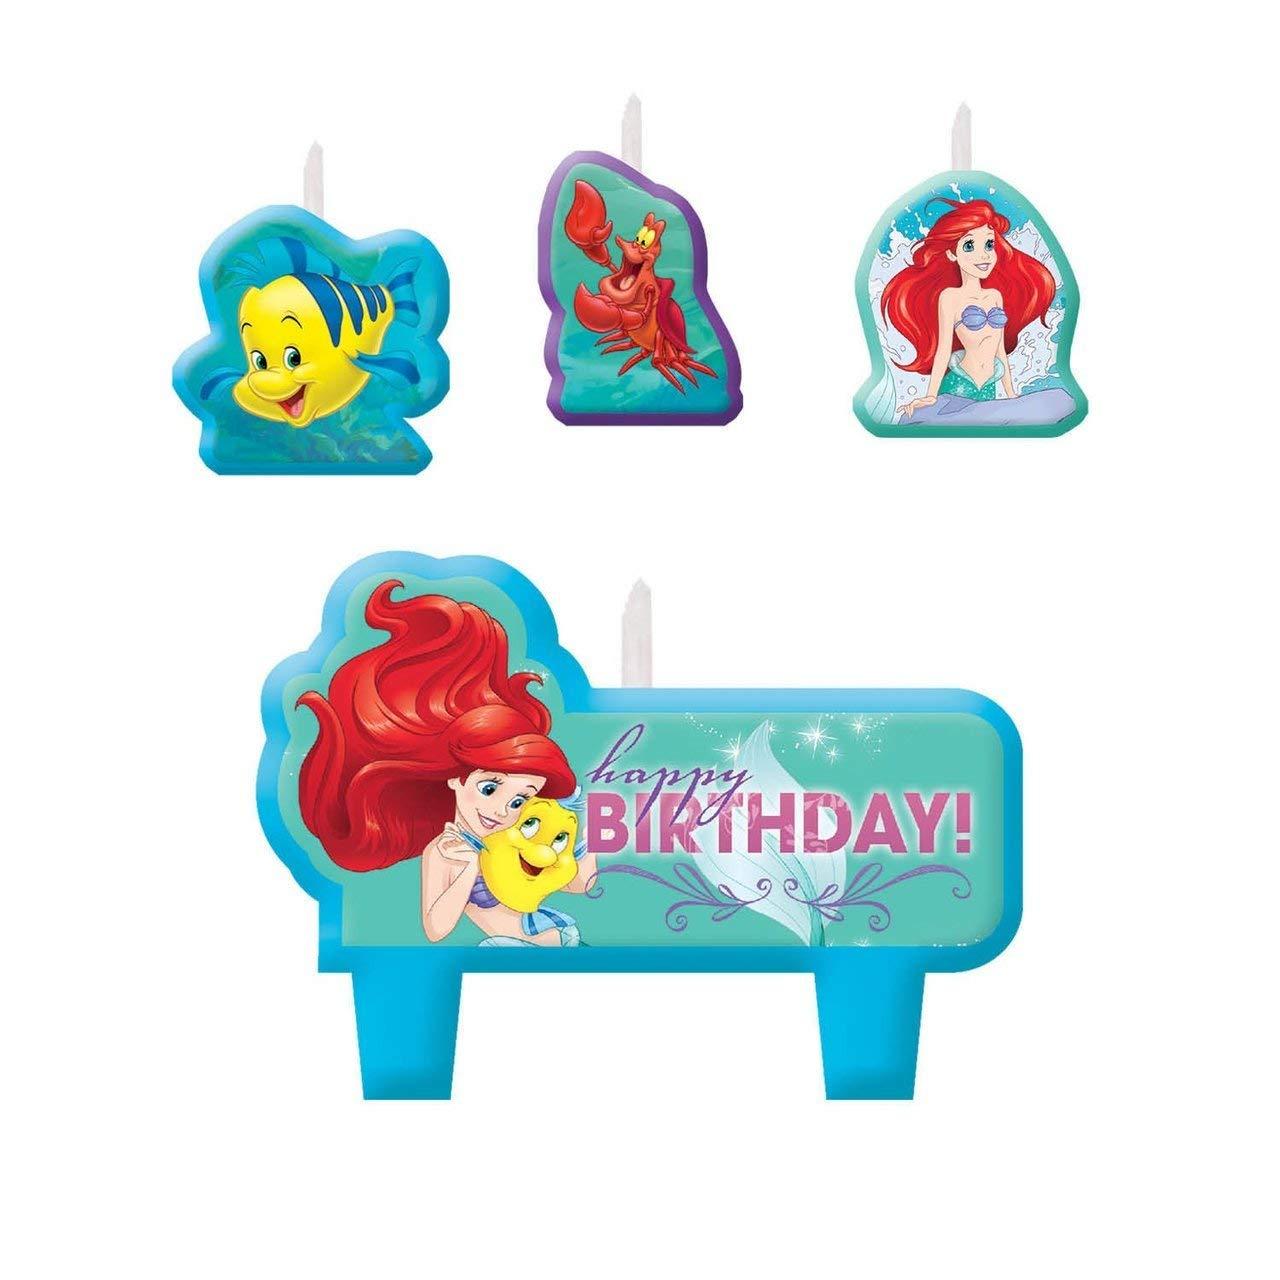 Disney Little Mermaid Birthday Candles Set of 4 171620